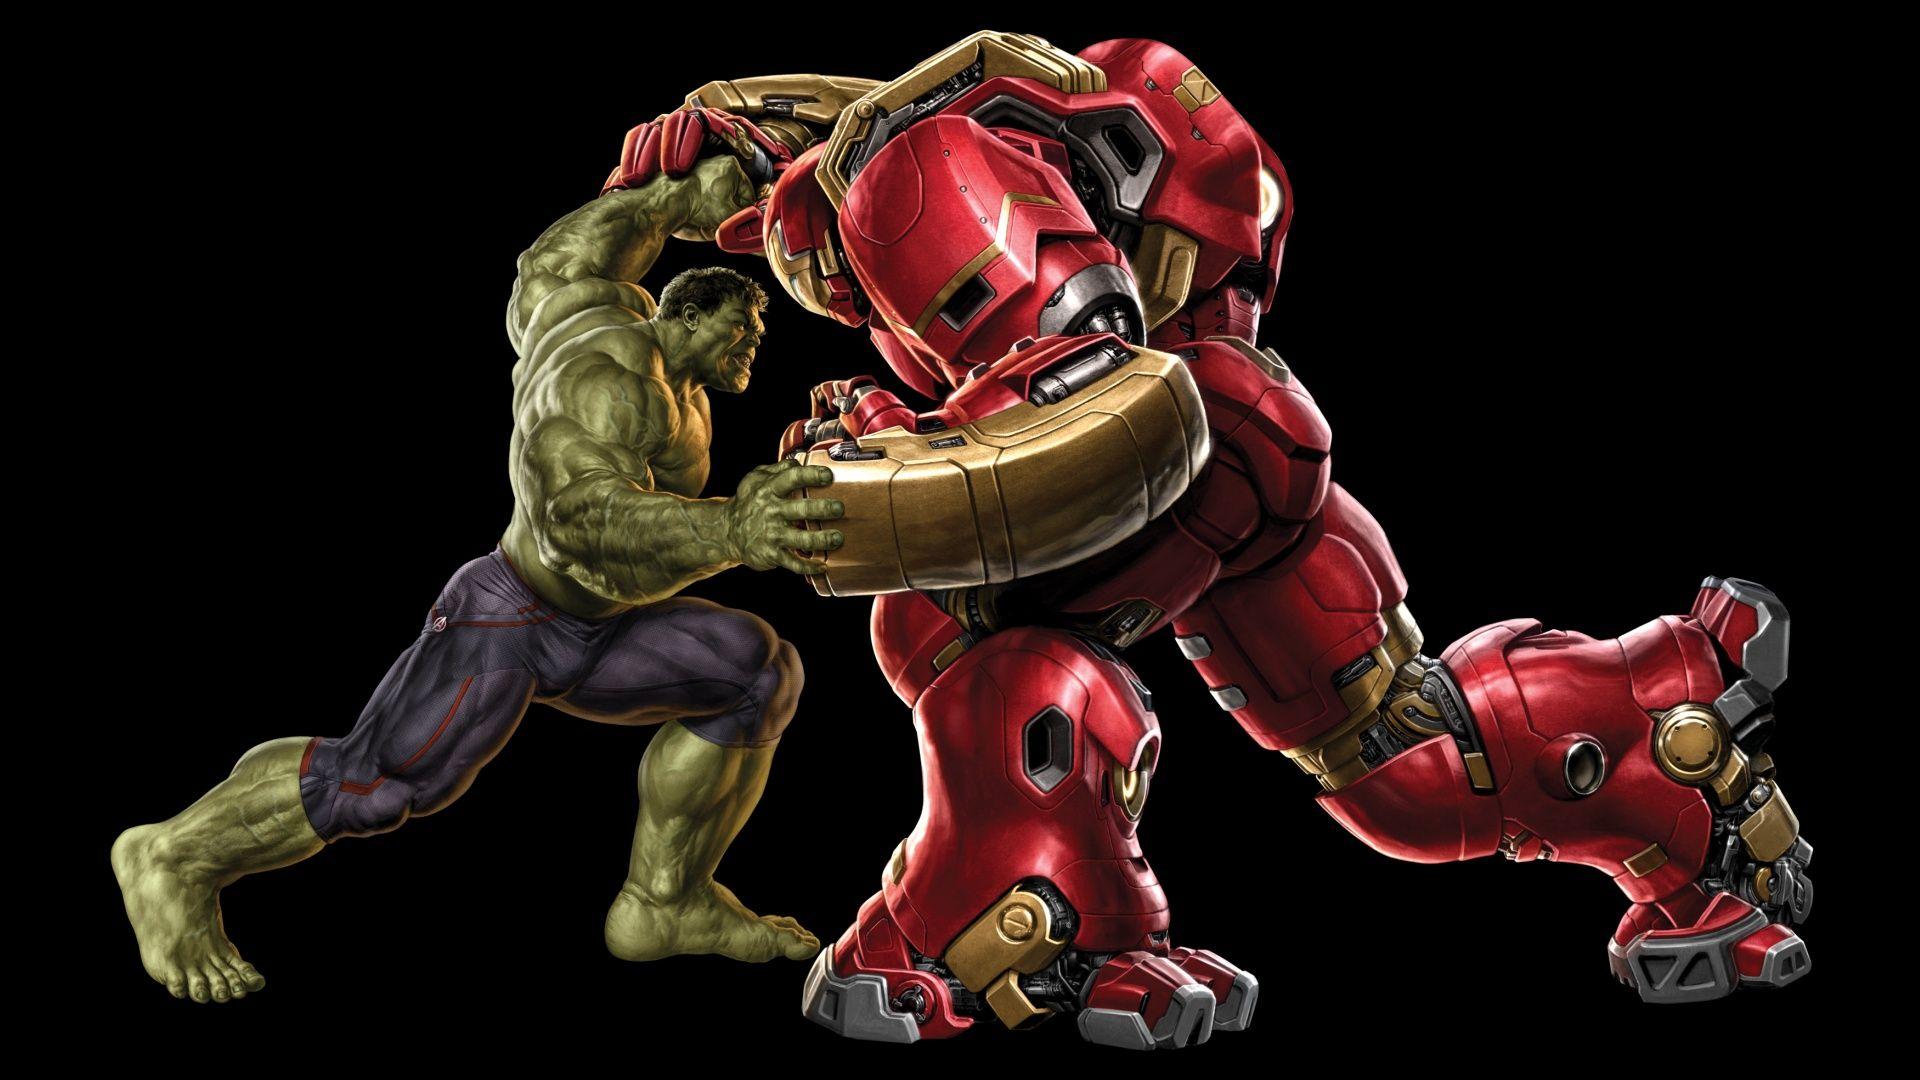 Hulk Vs Hulkbuster Wallpaper Marvel Comics Pinterest